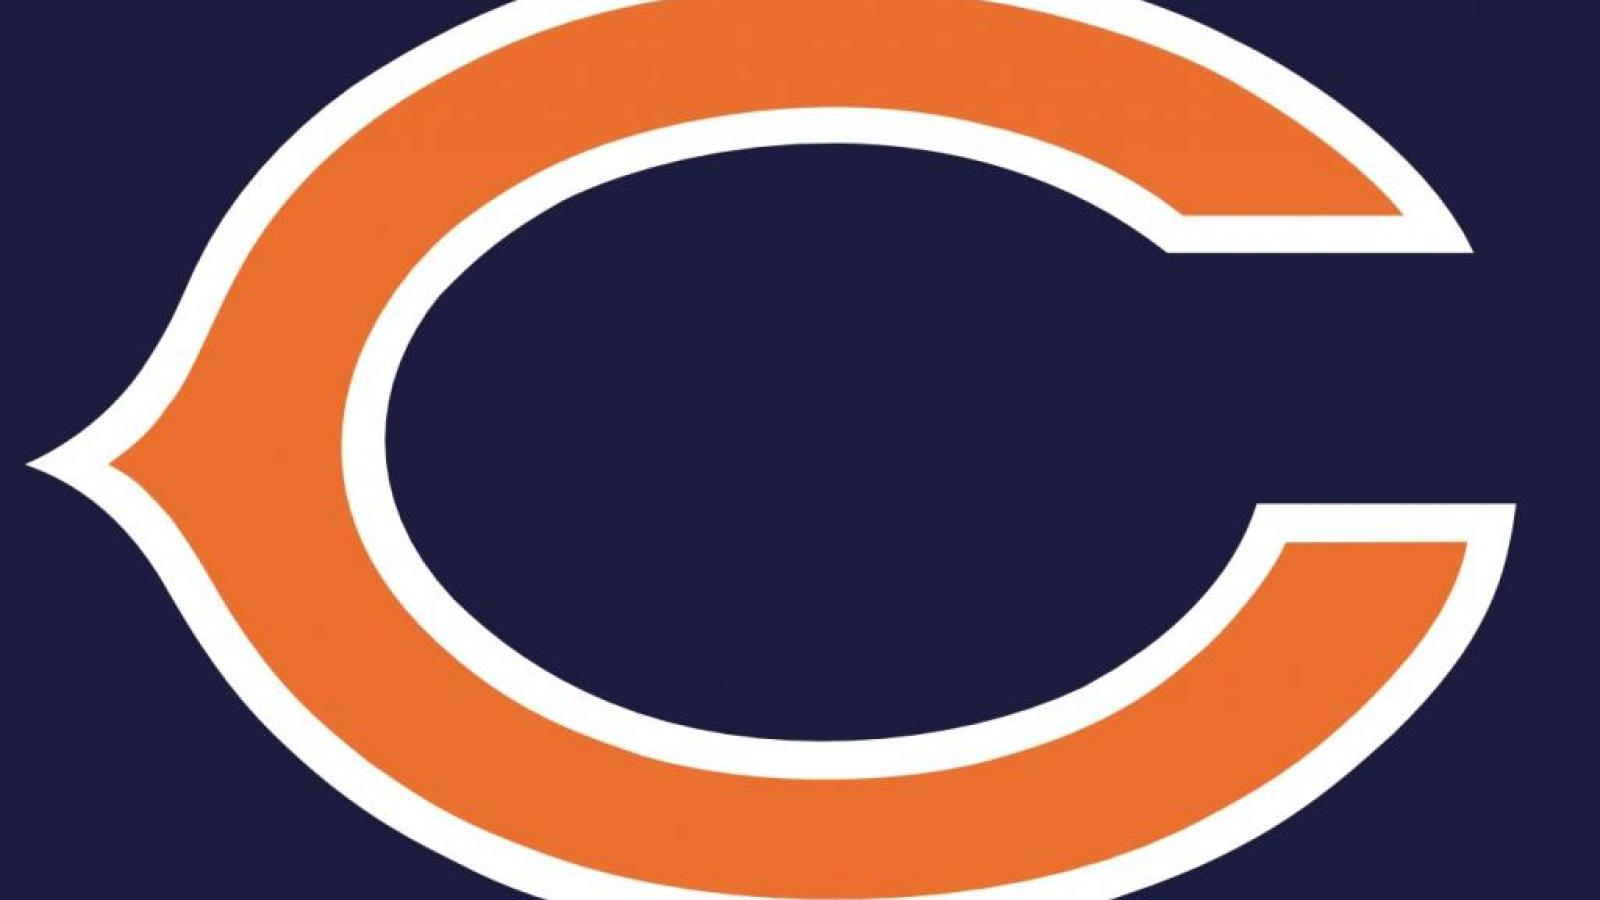 chicago bears logo wallpaper   80523   HQ Desktop Wallpapers 1600x900